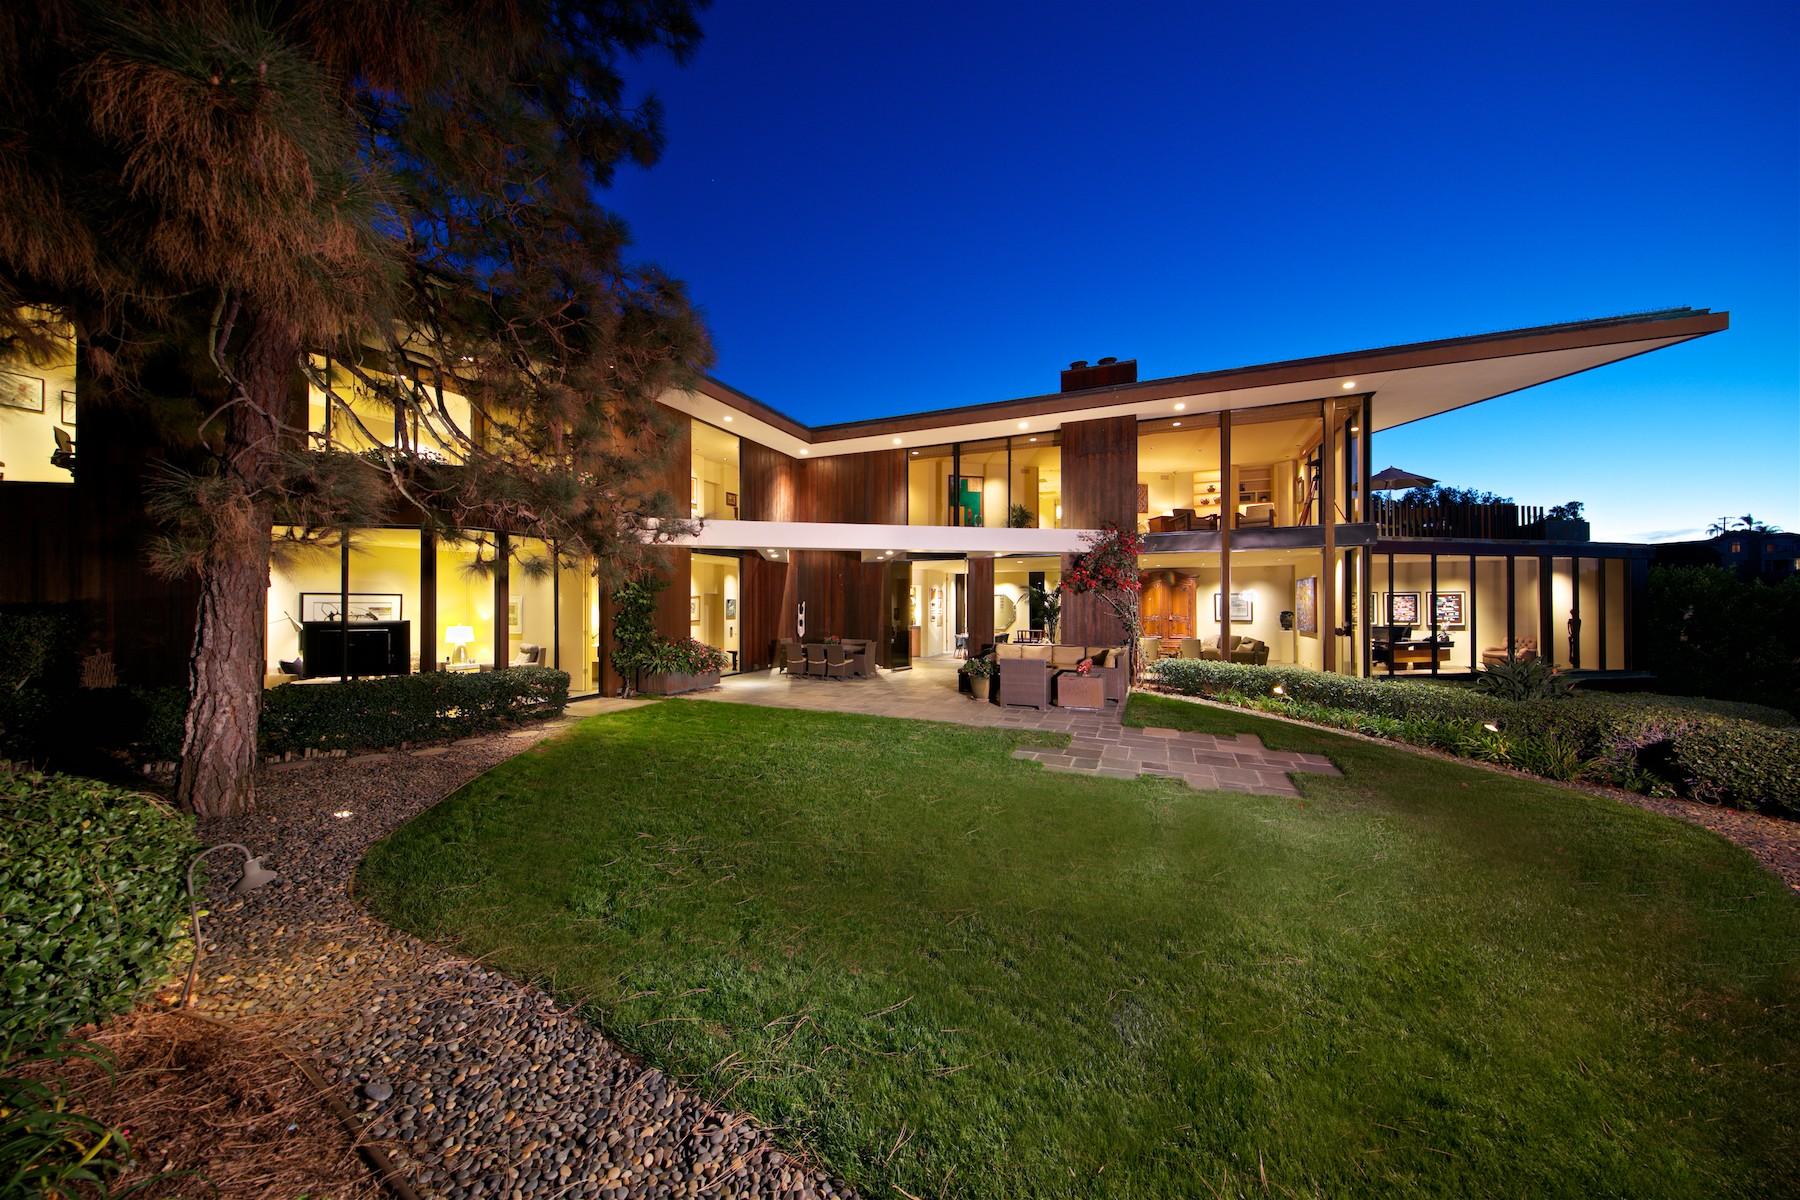 Single Family Home for Sale at 1585 Coast Walk La Jolla, California 92037 United States